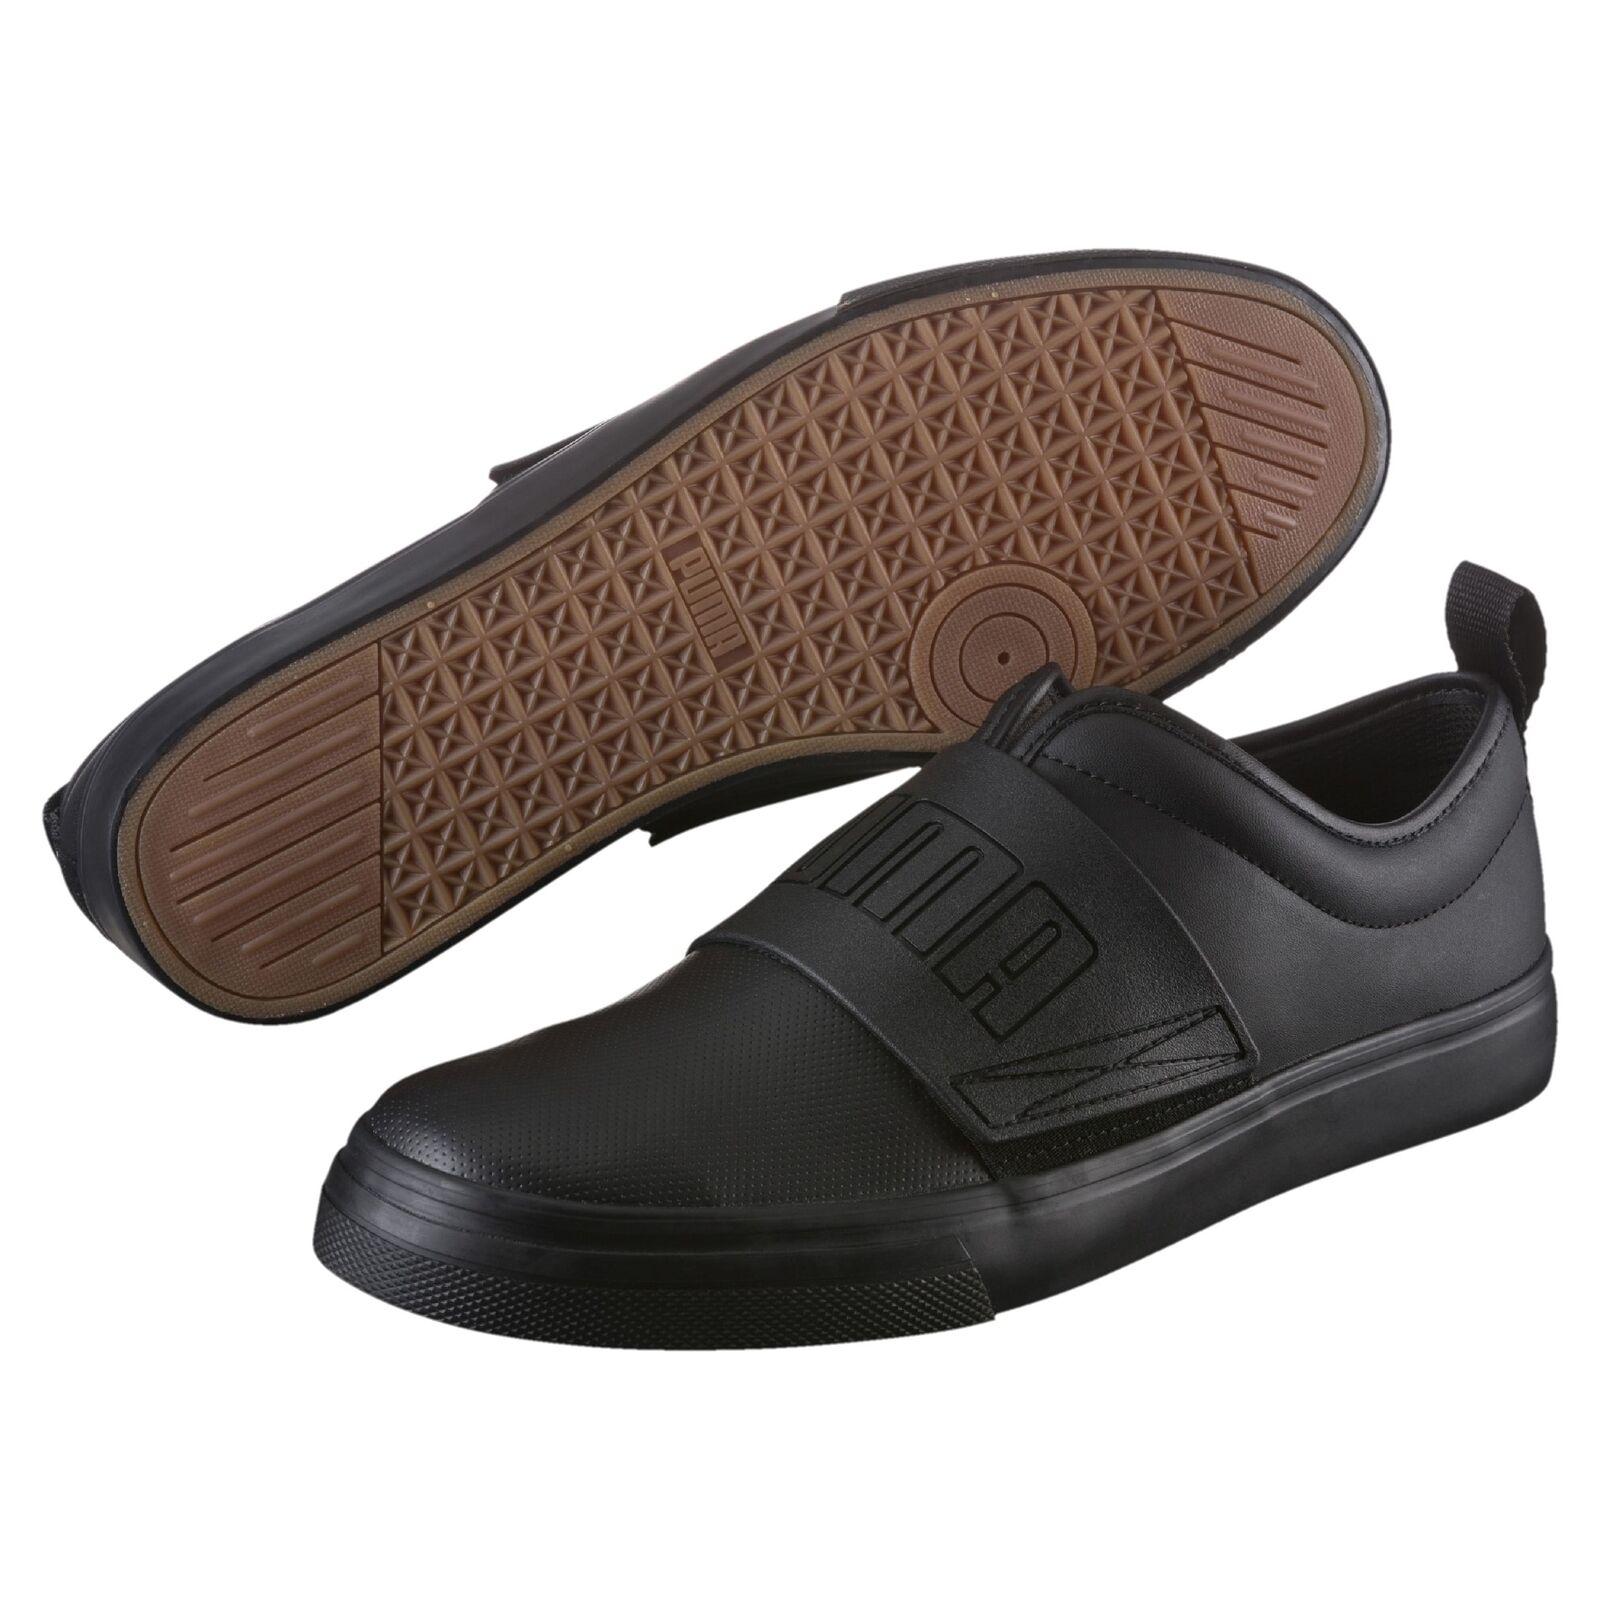 PUMB El Rey FUN Sneaker Unisex Schuhe Basics Neu